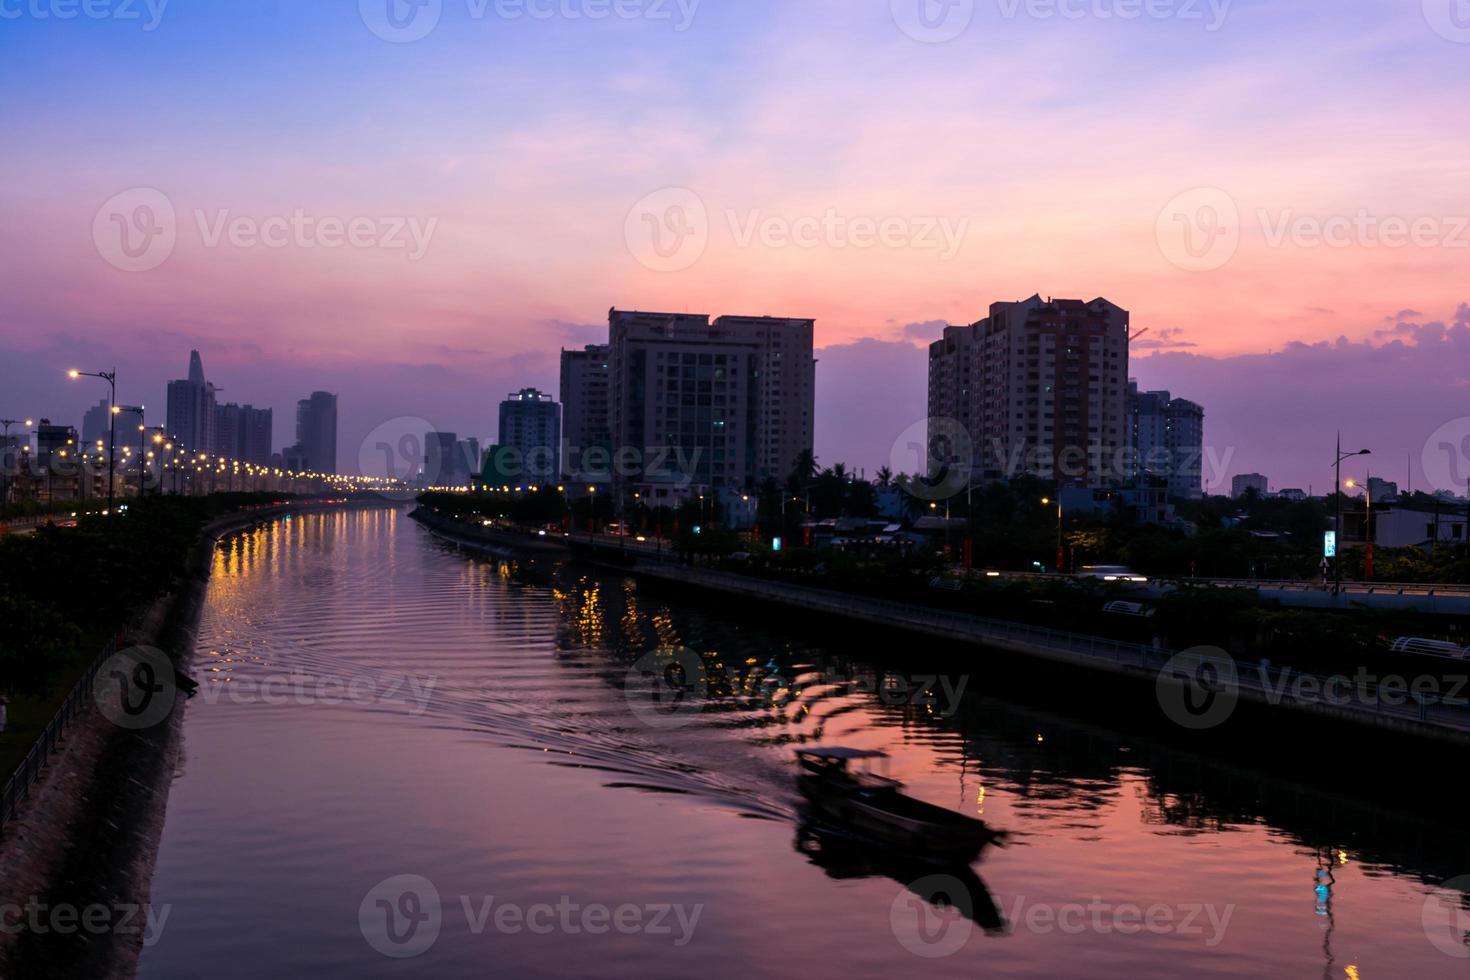 Sunrise time at Saigon Ho chimin photo